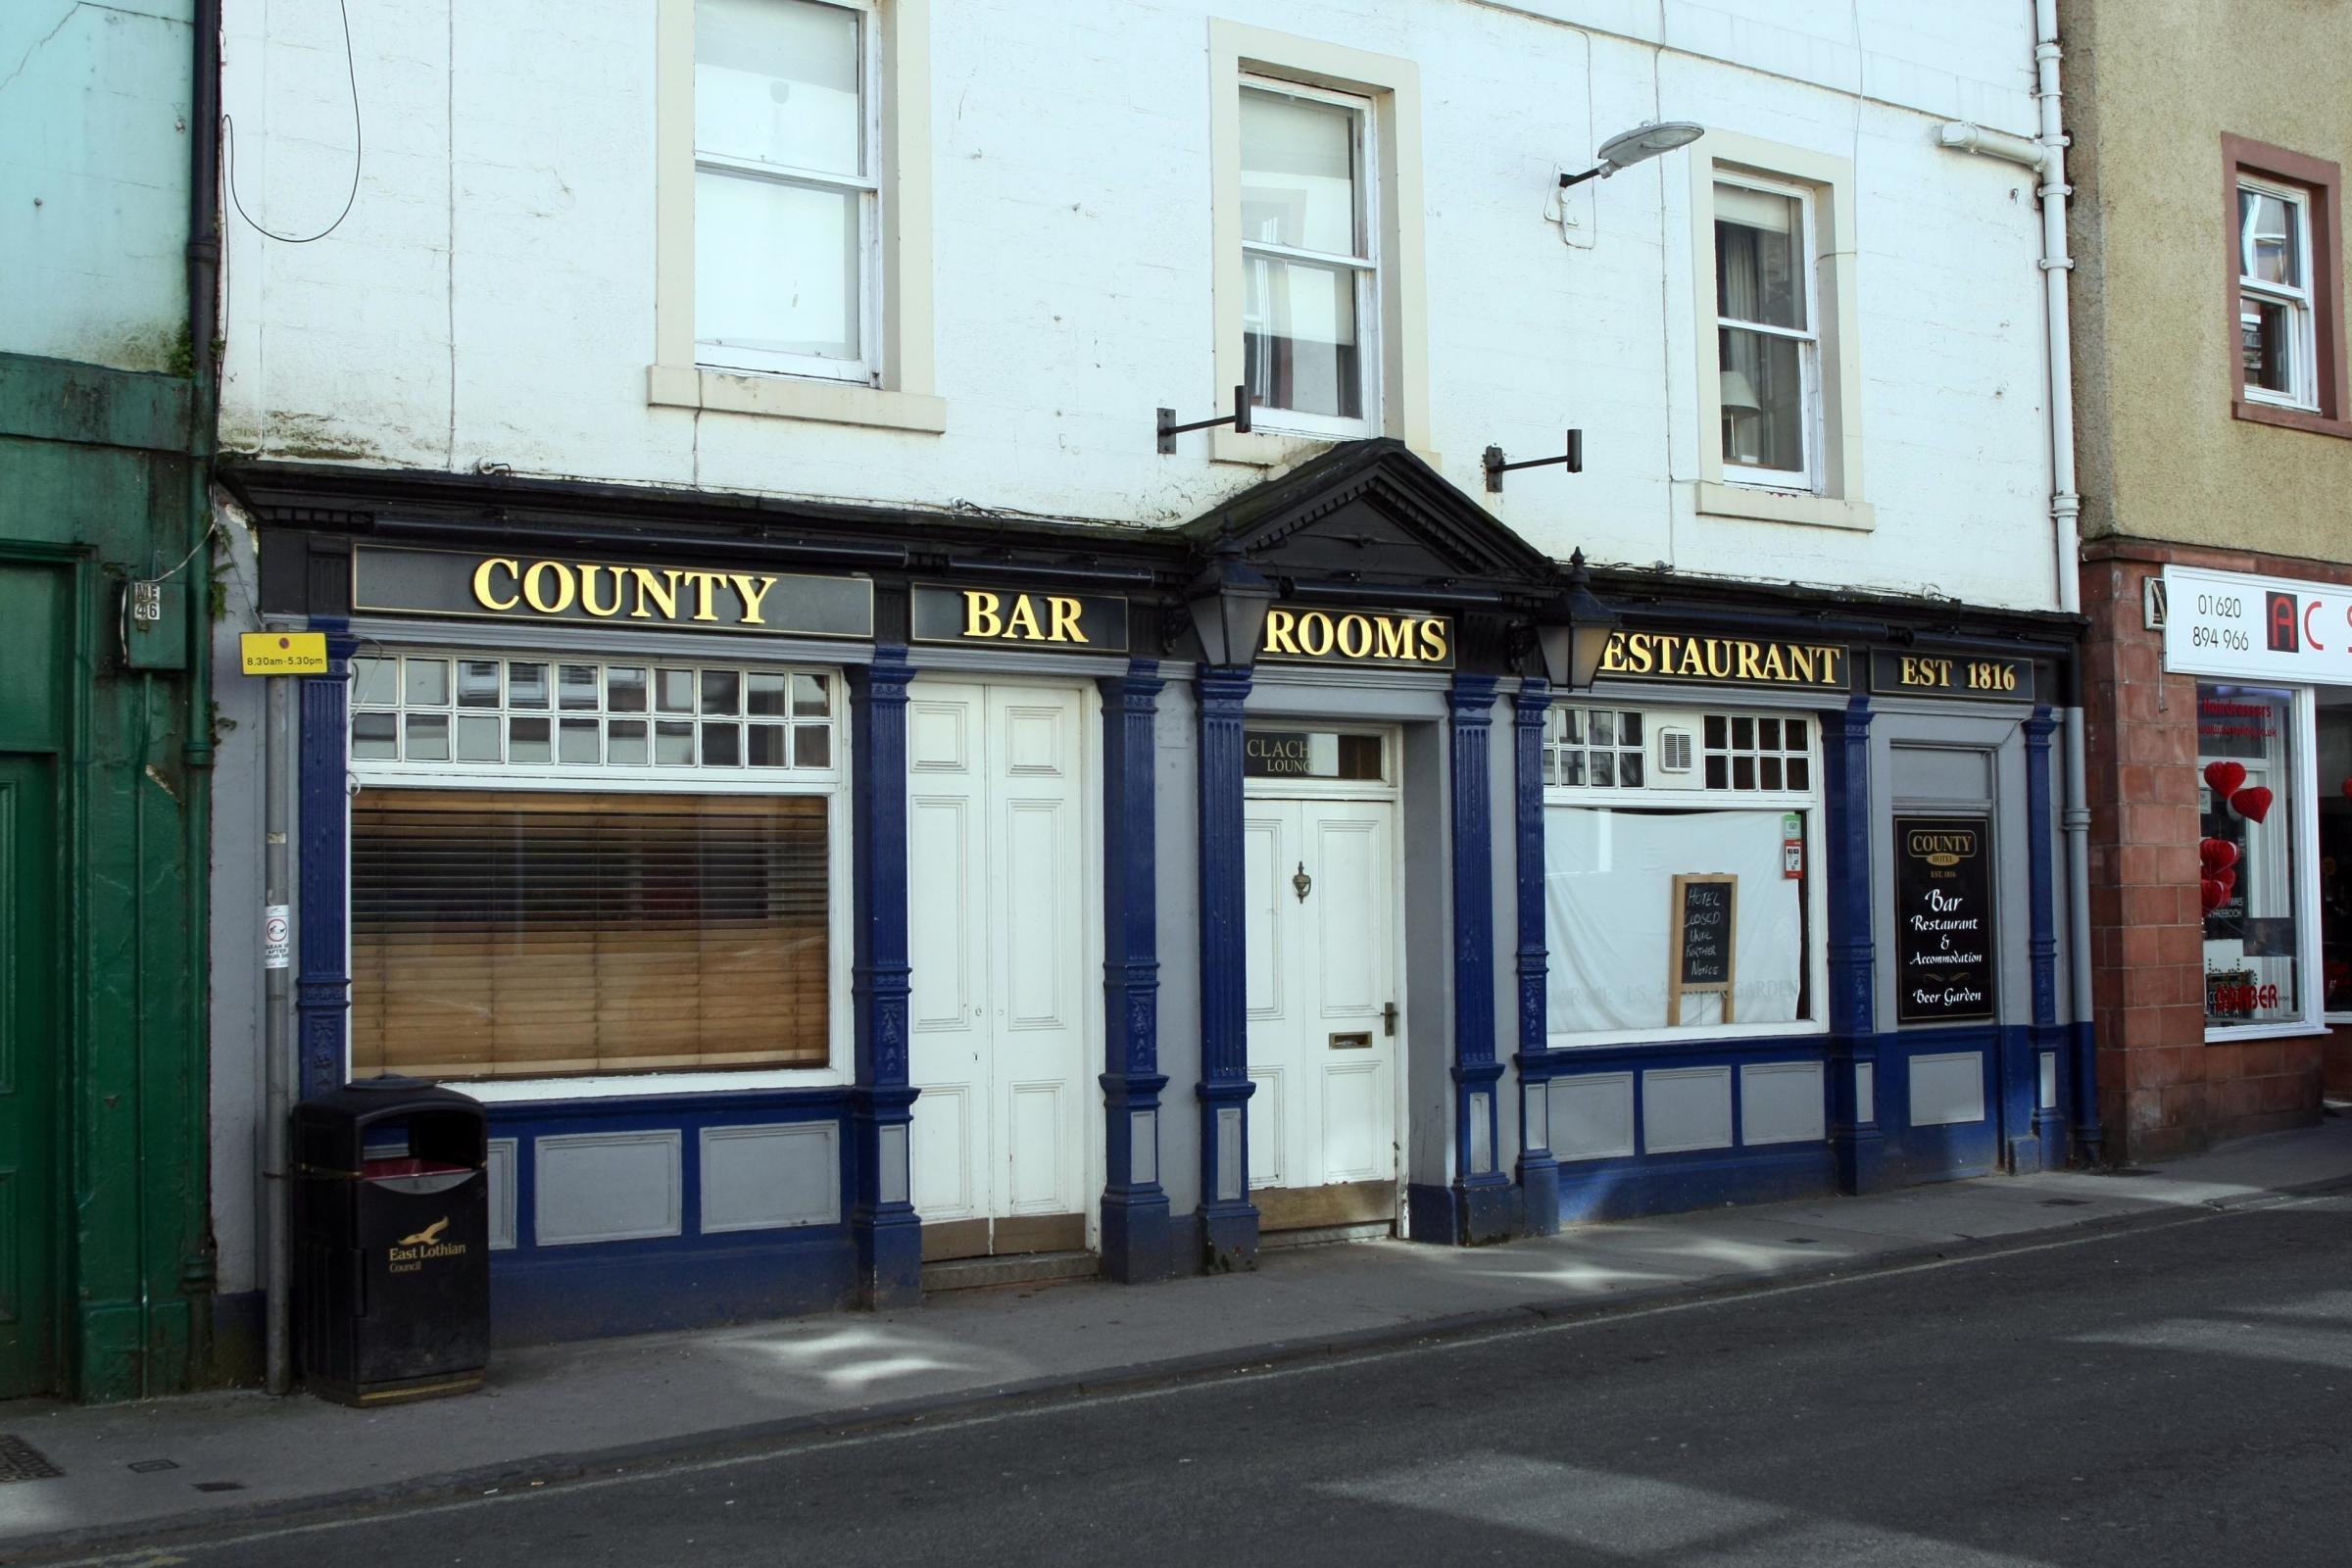 County hotel north berwick menu